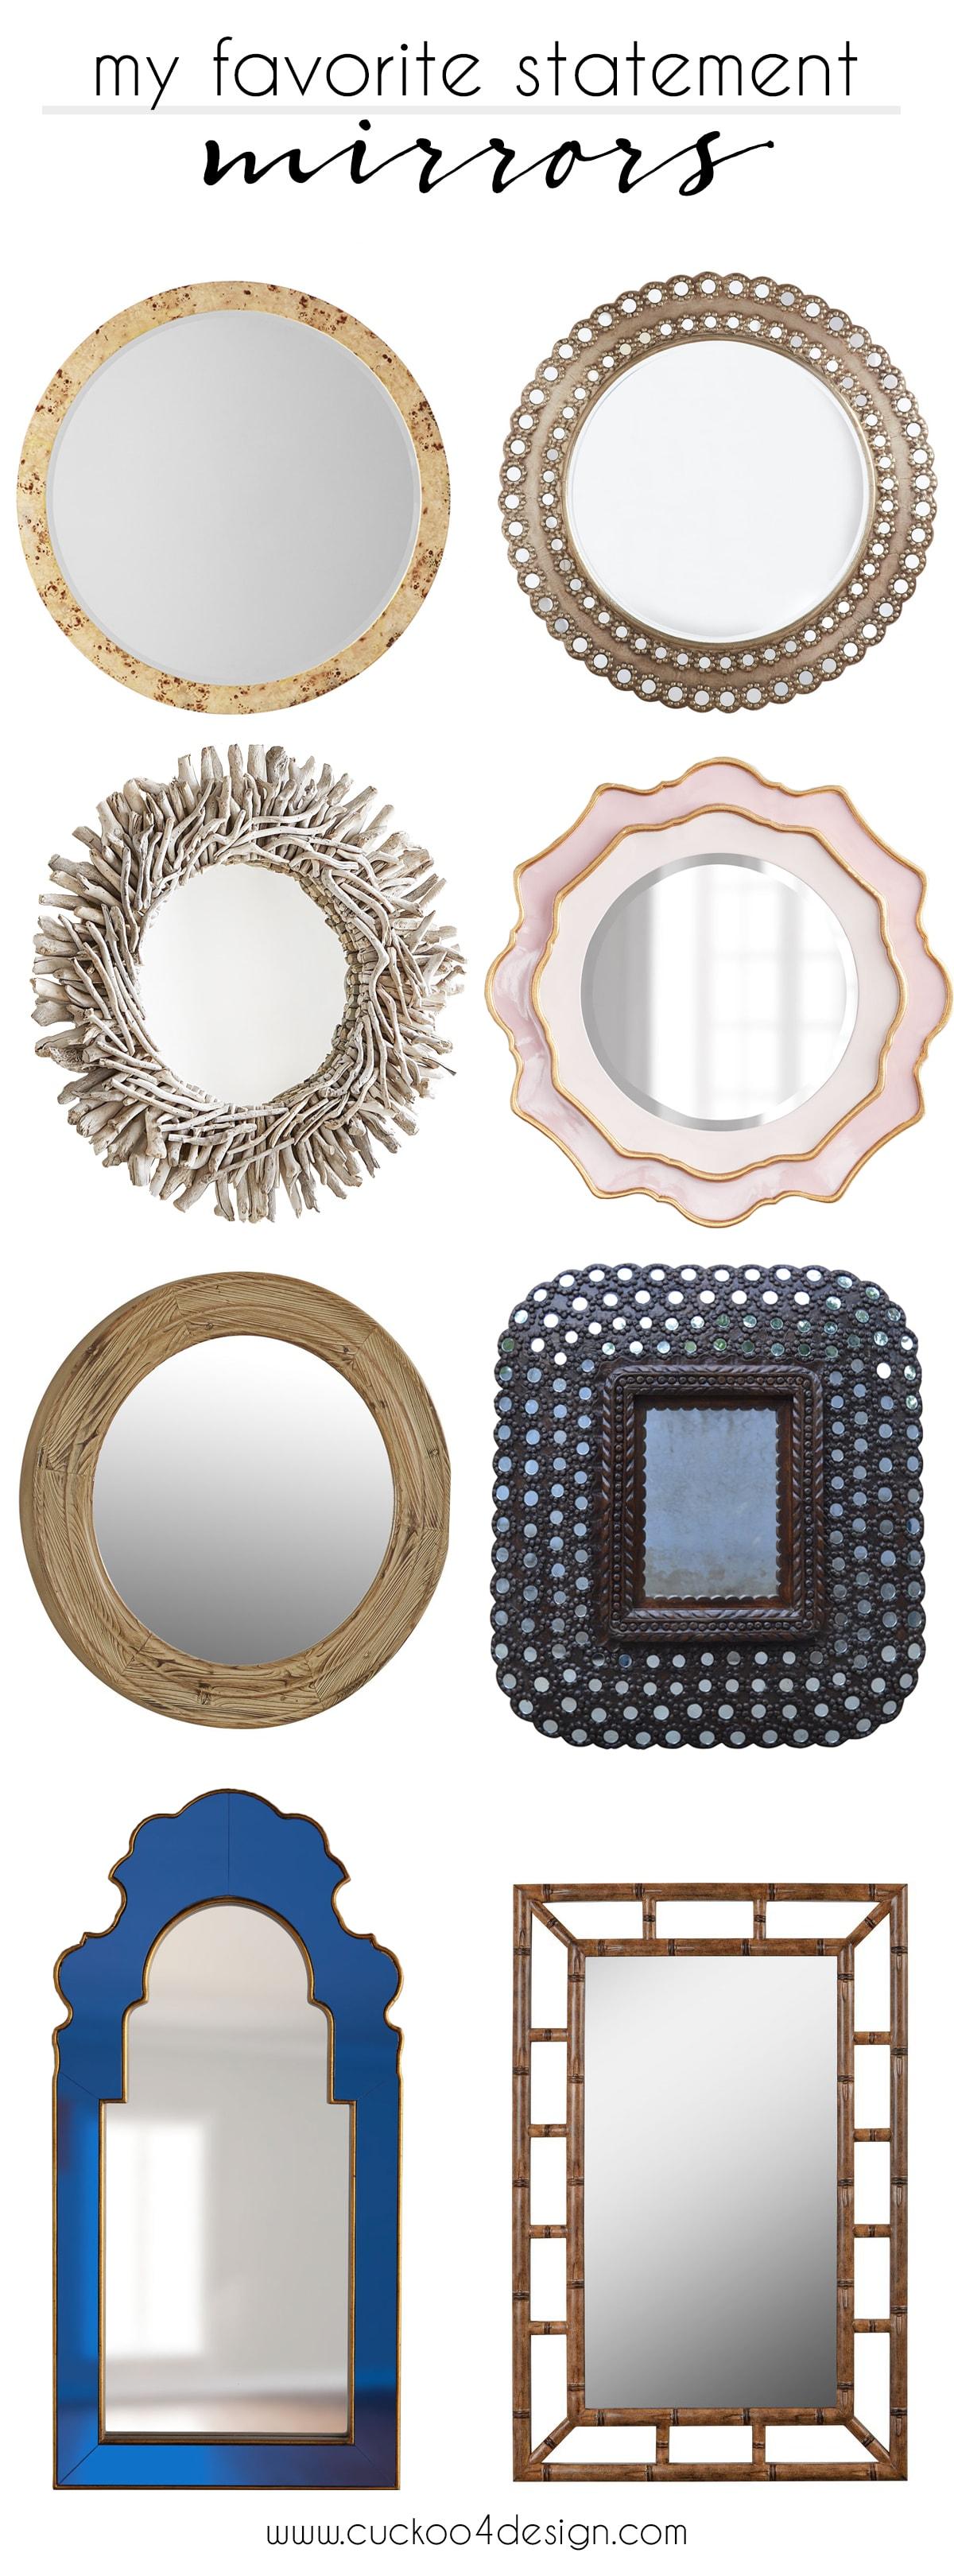 my favorite statement mirrors | burl wood mirror | drift wood mirror | cobalt blue mirror | blush mirror | unfinished wood mirror | peacock mirror